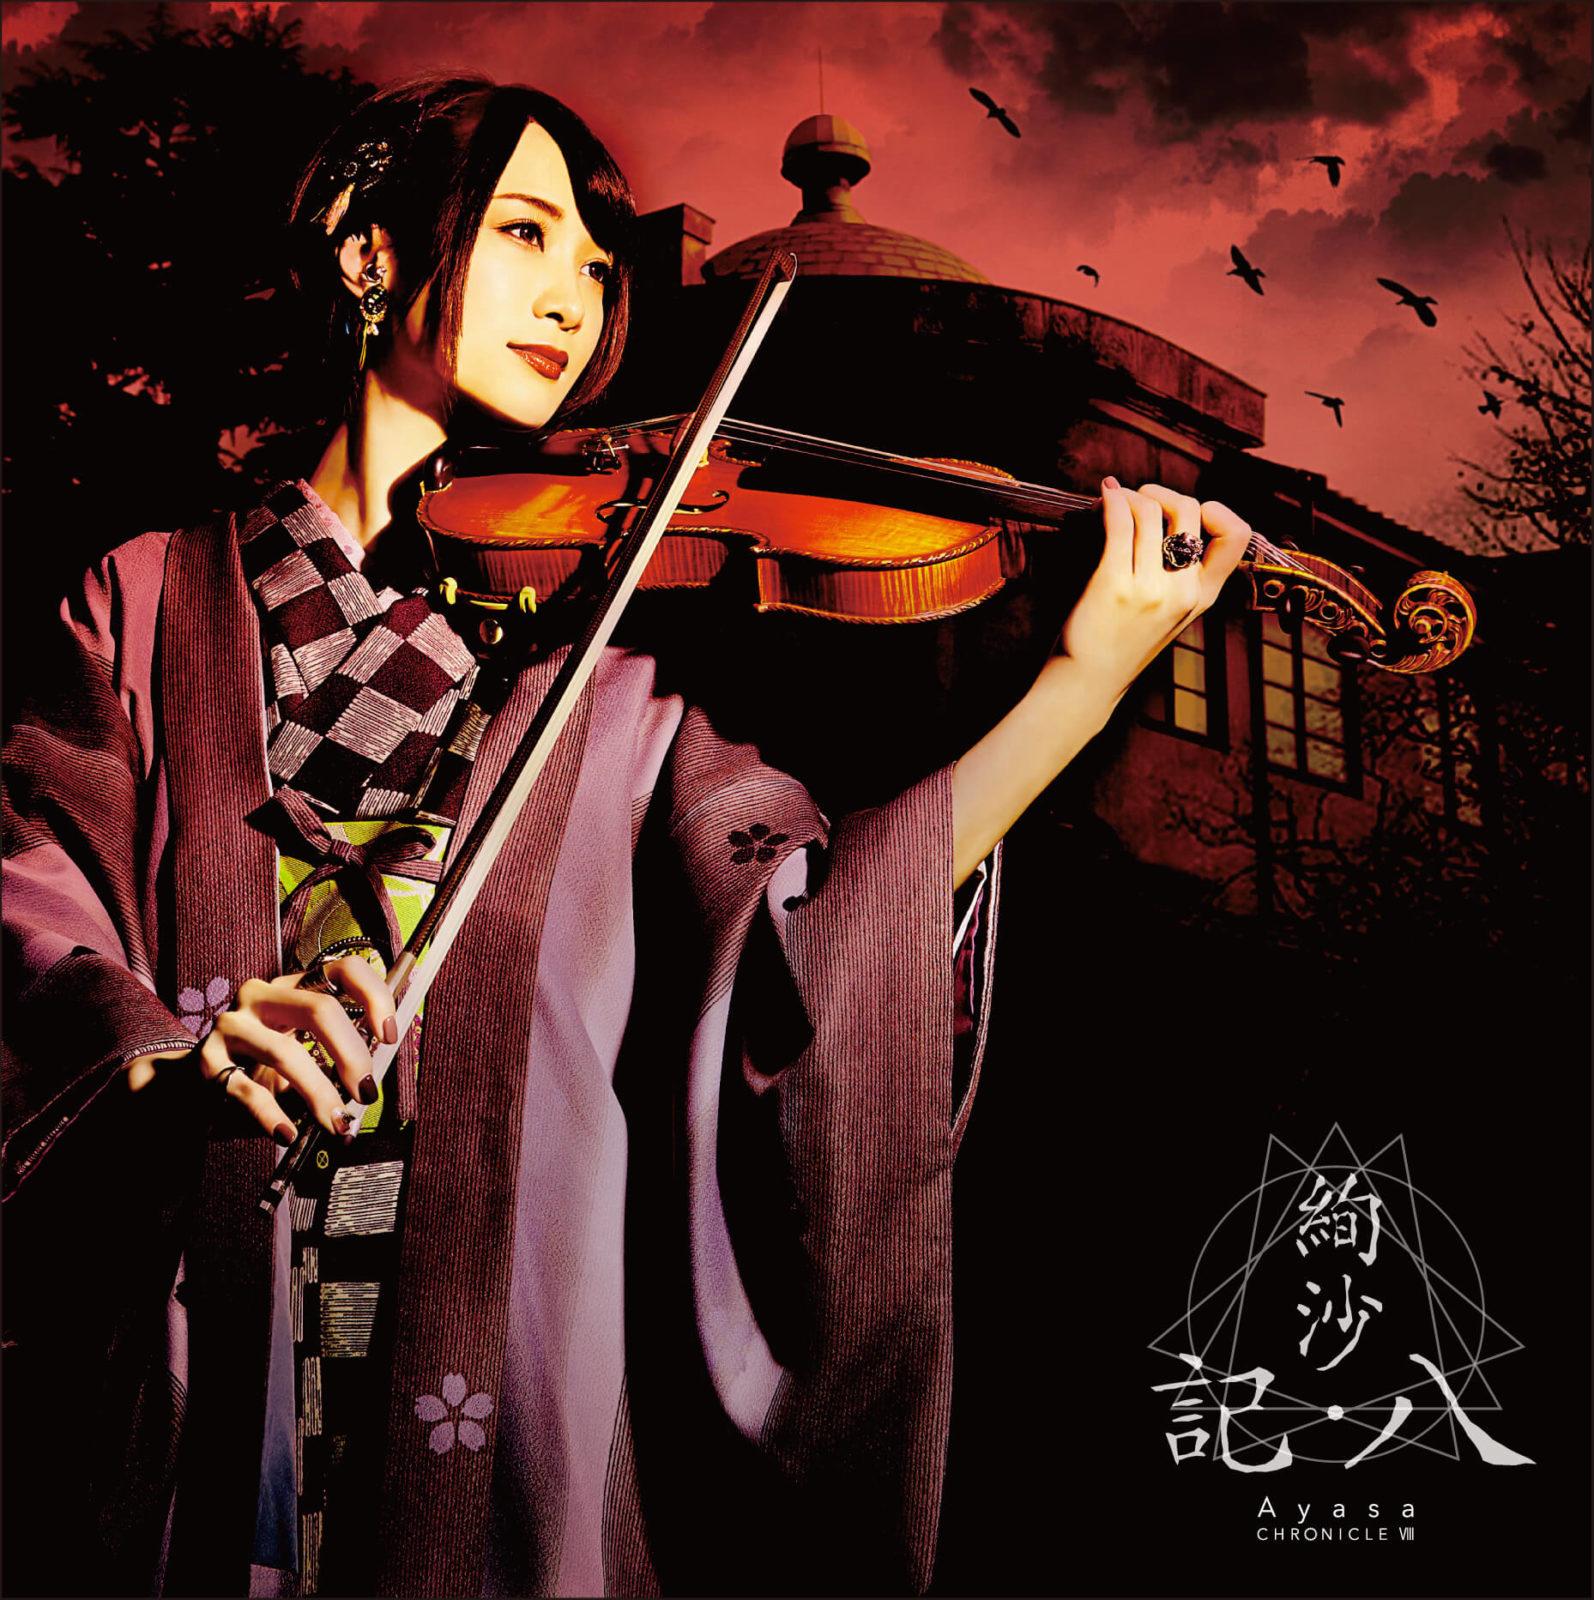 Ayasa、9月1日に「CHRONICLE VIII」を配信、4ヶ月連続 アルバムリリースサムネイル画像